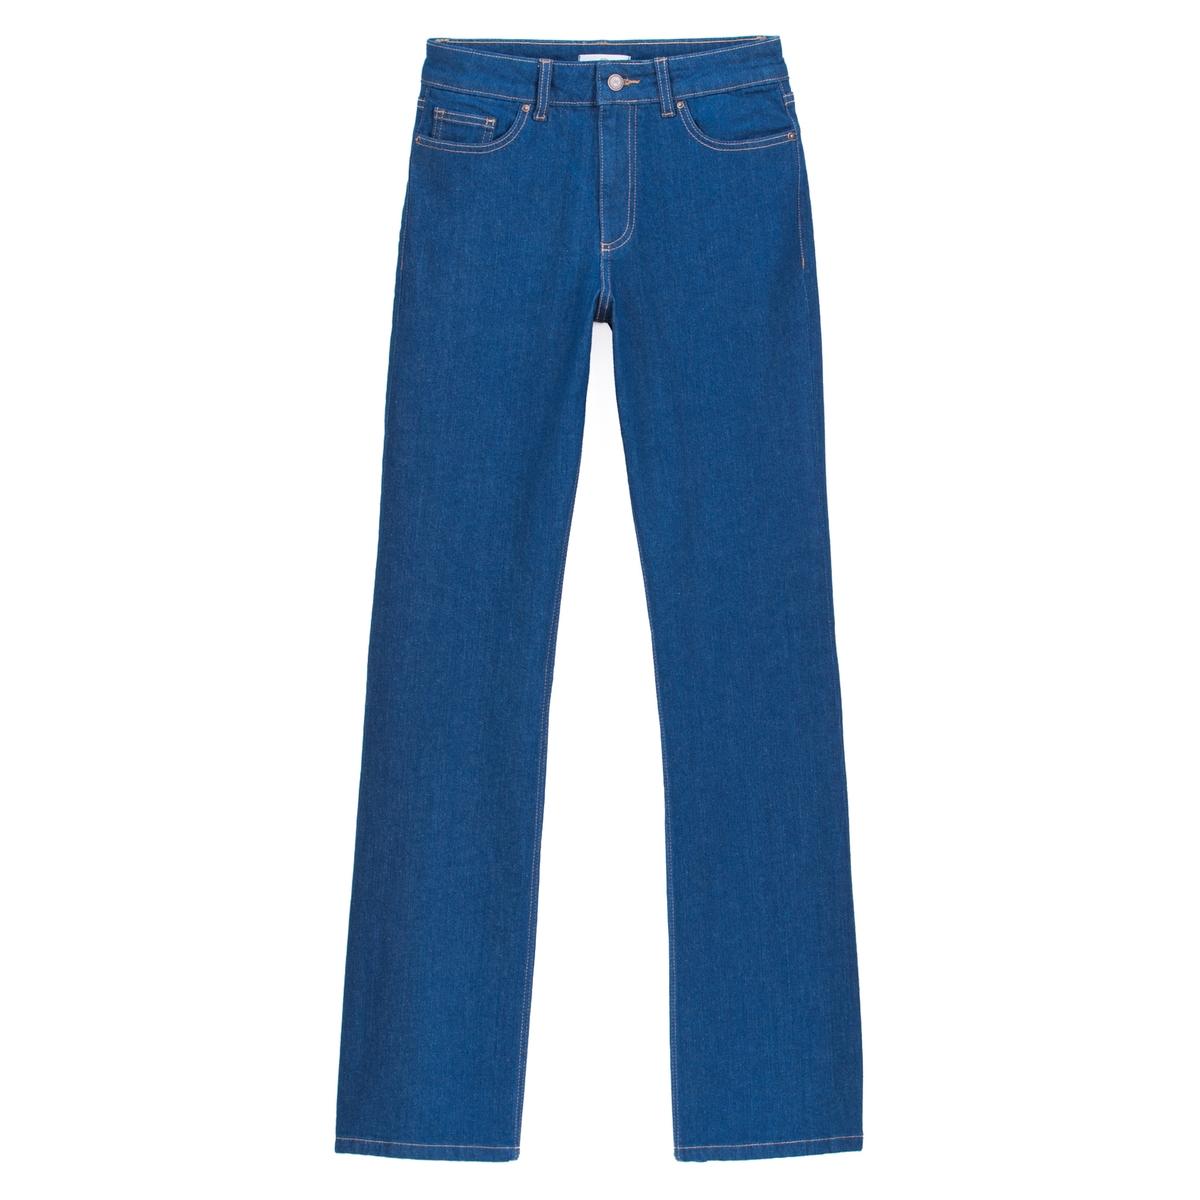 Jeans largos, cintura subida